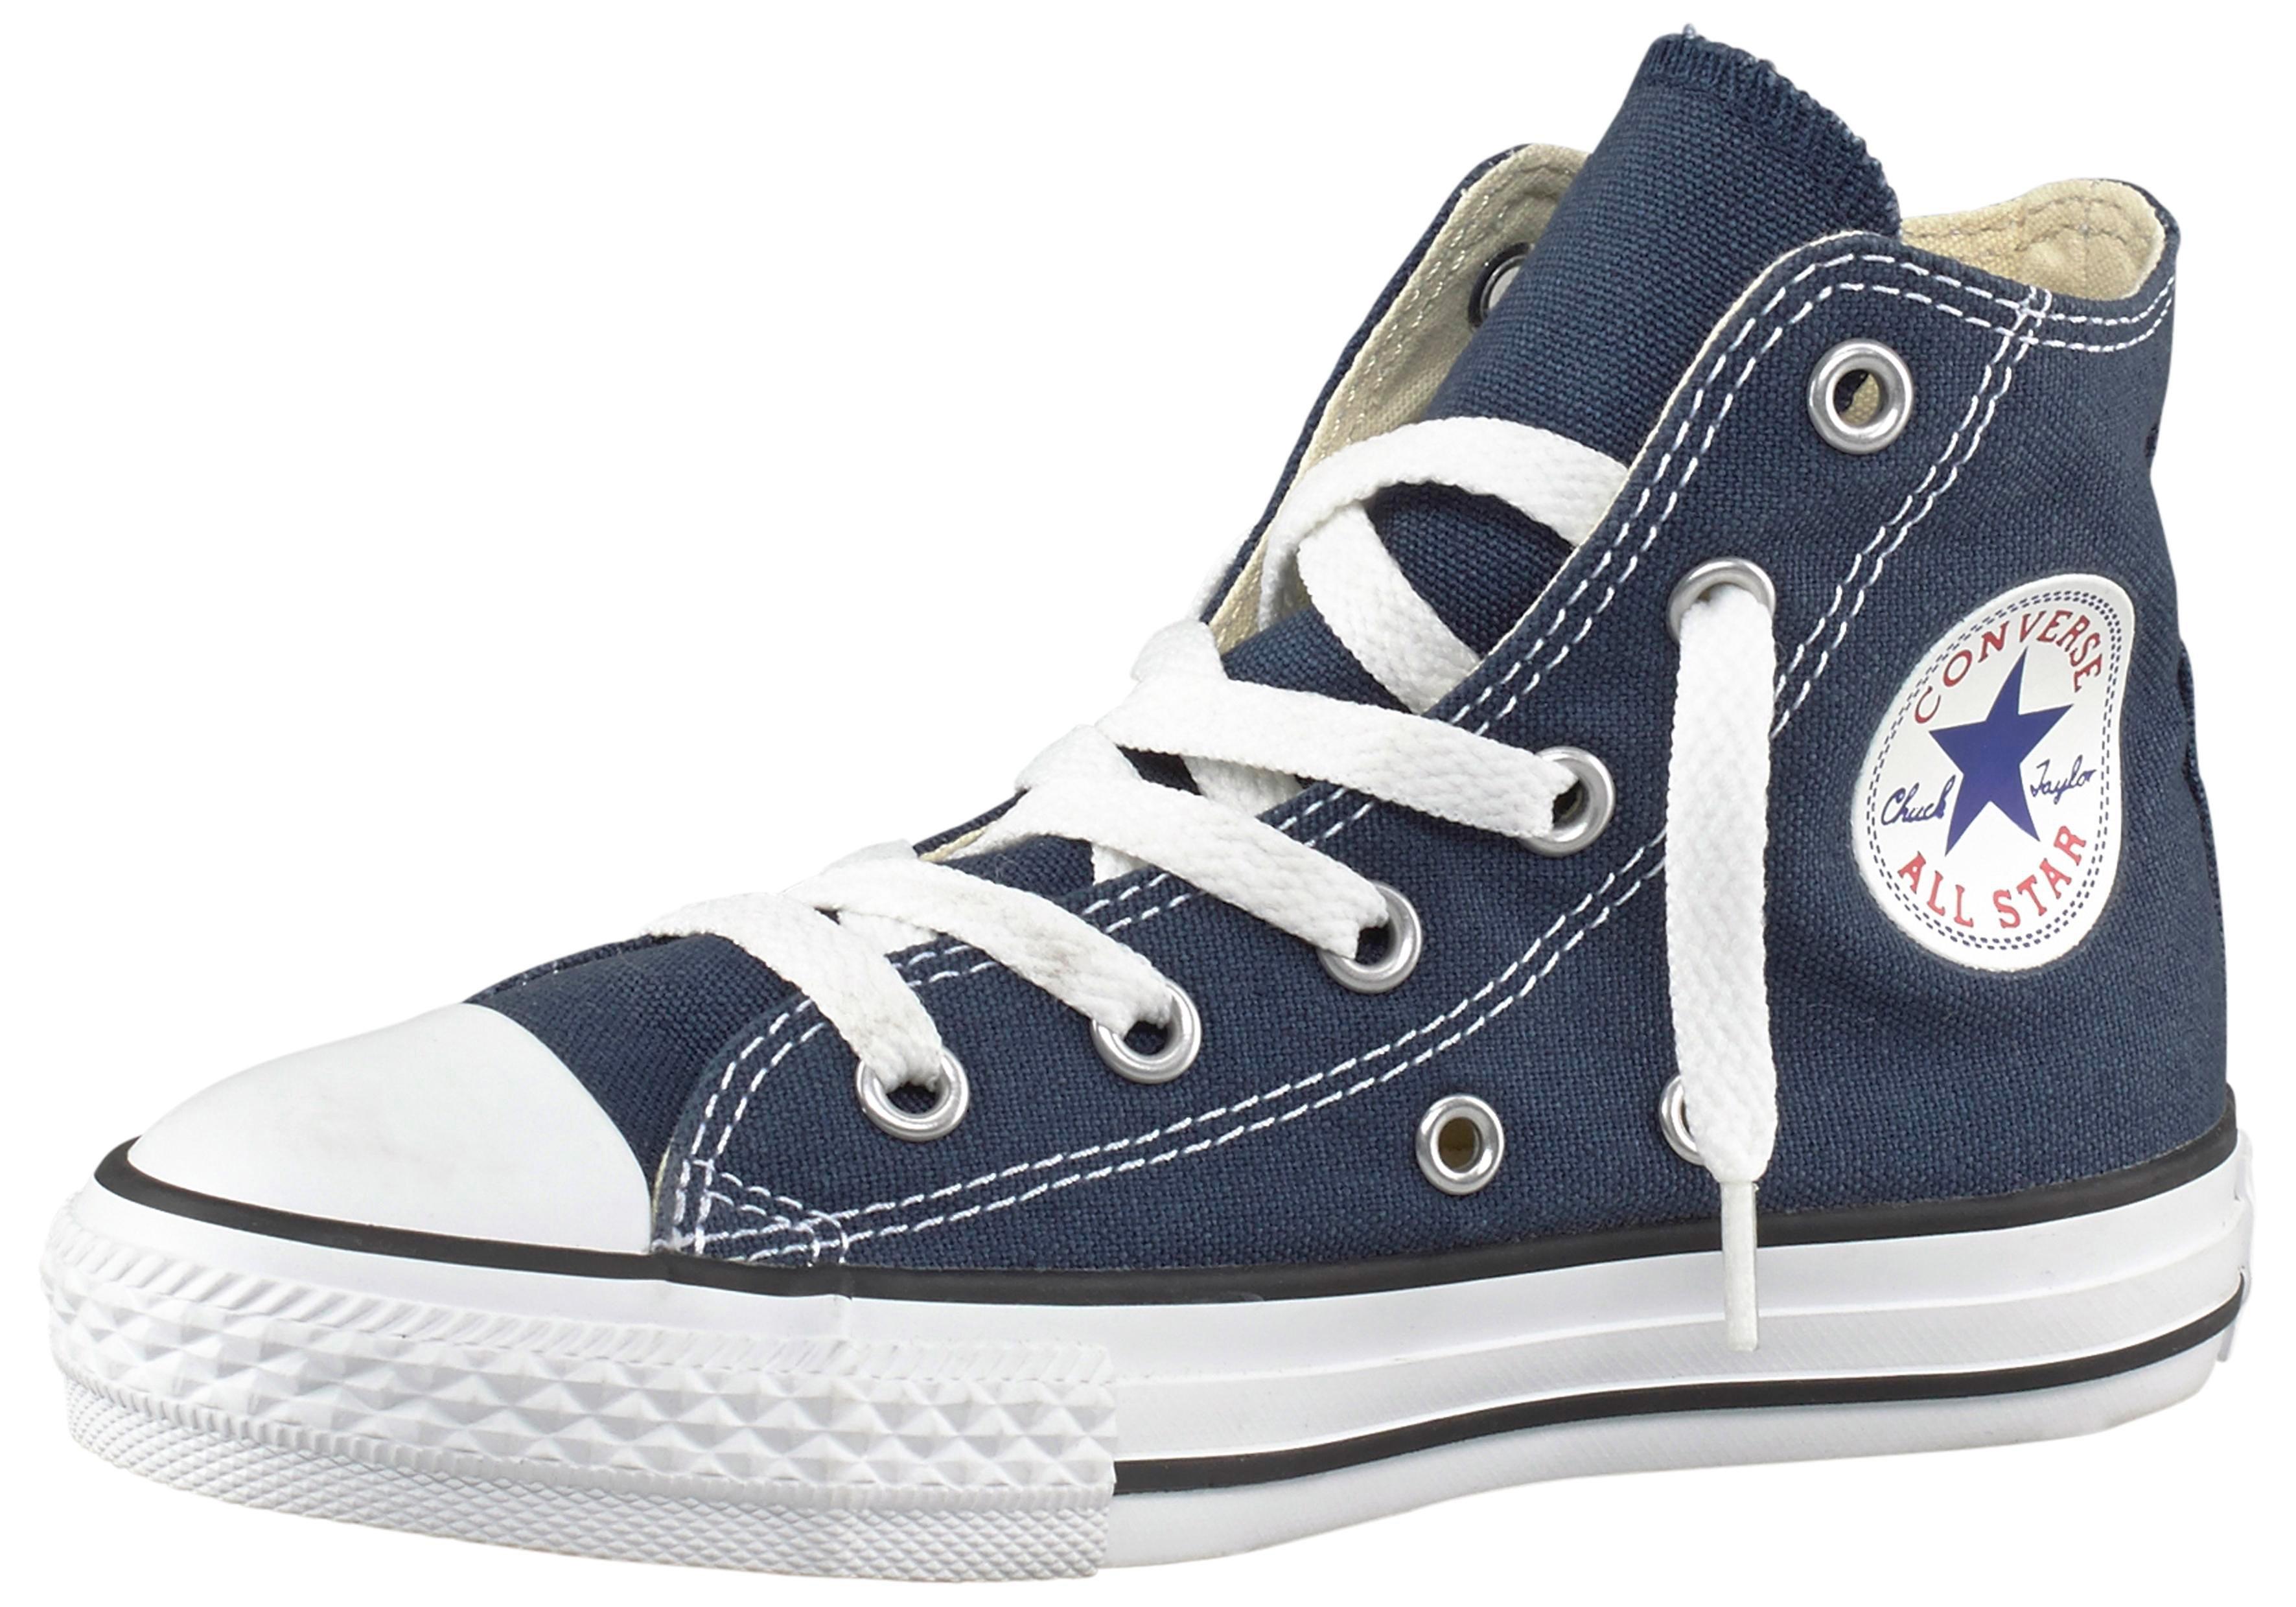 Converse Kinder-sneakers Chuck Taylor - verschillende betaalmethodes